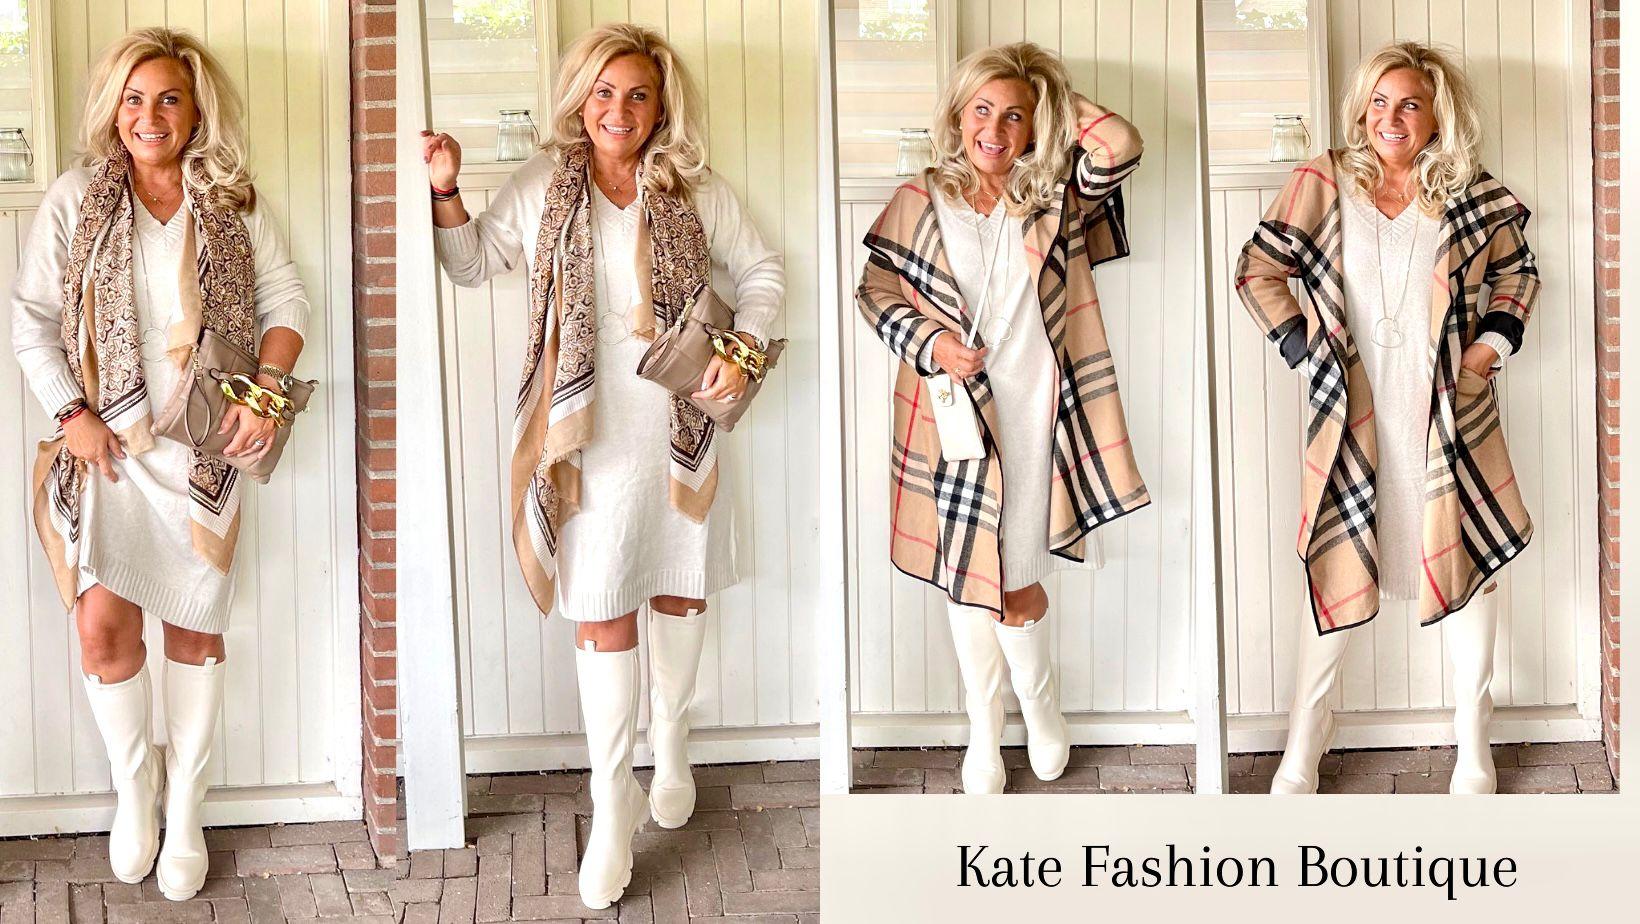 Kate Fashion Boutique